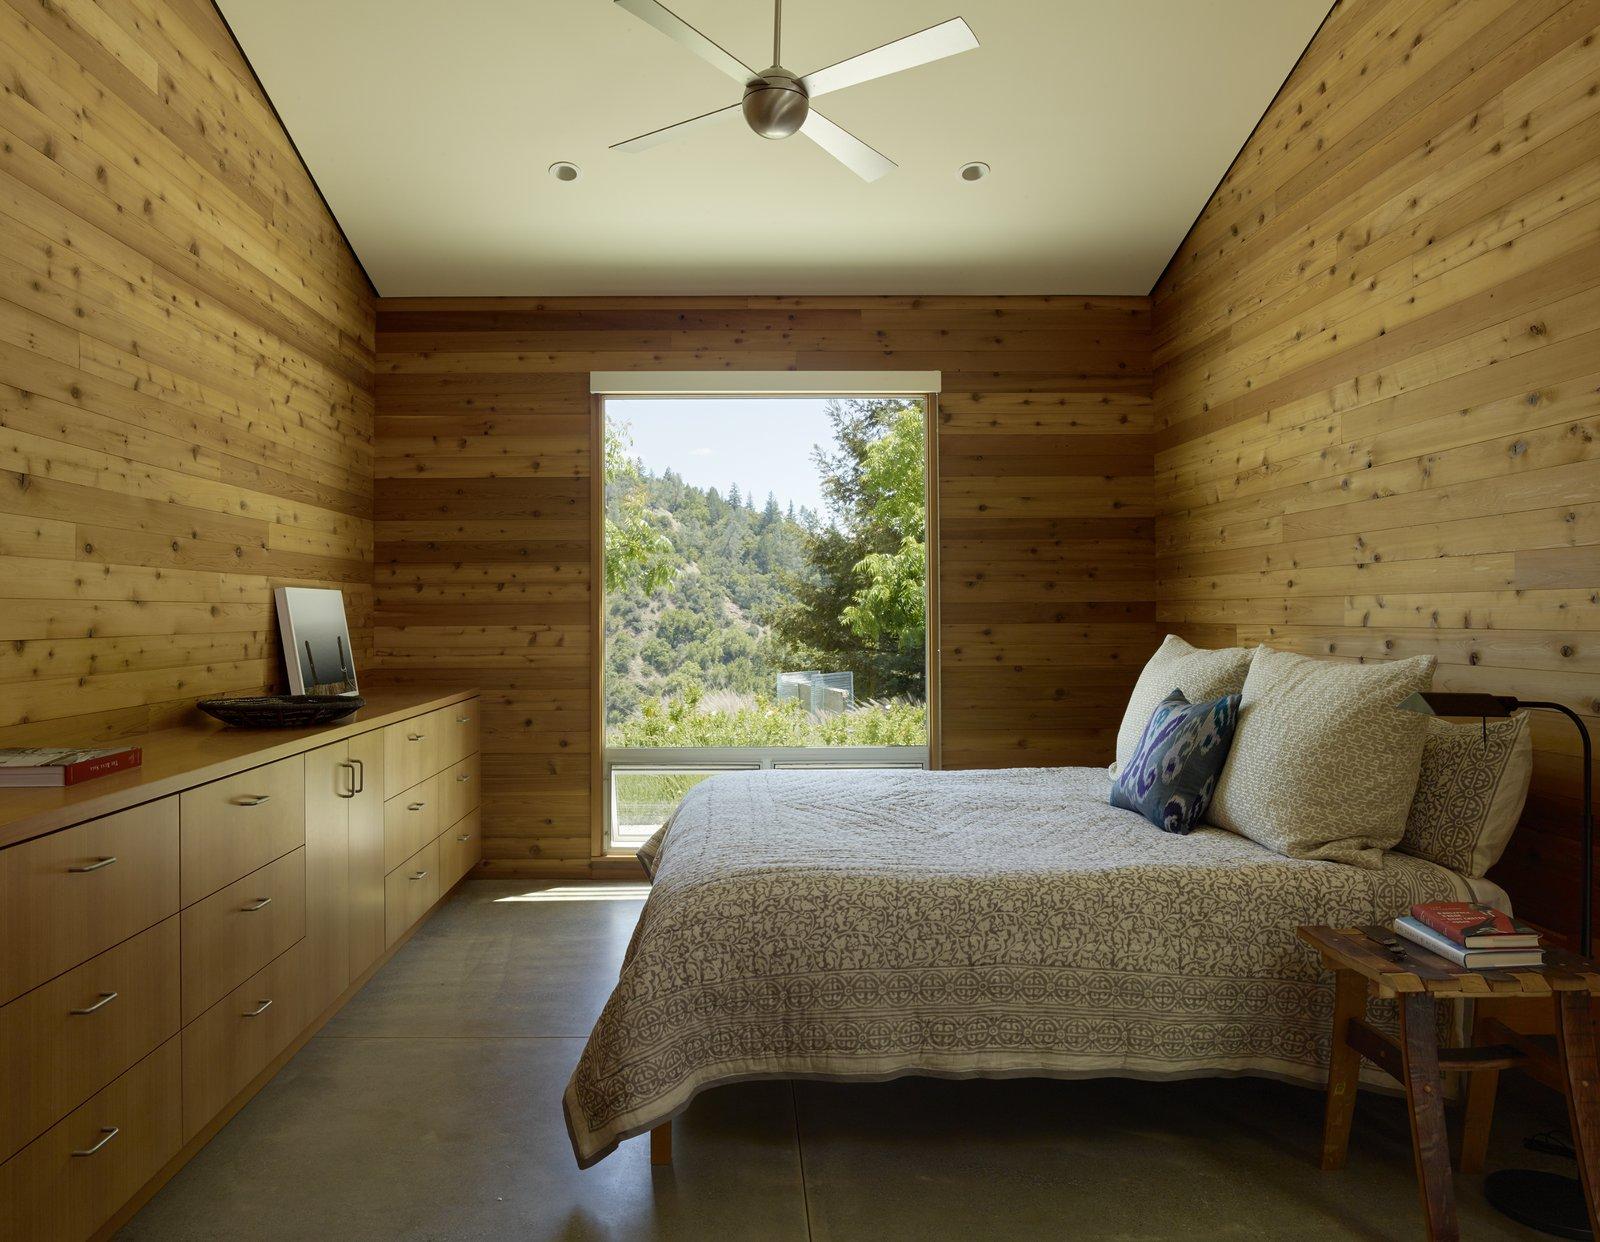 Bedroom, Bed, Night Stands, Storage, Recessed Lighting, and Concrete Floor #TurnbullGriffinHaesloop #interior #bedroom #window  Best Photos from Cloverdale Residence